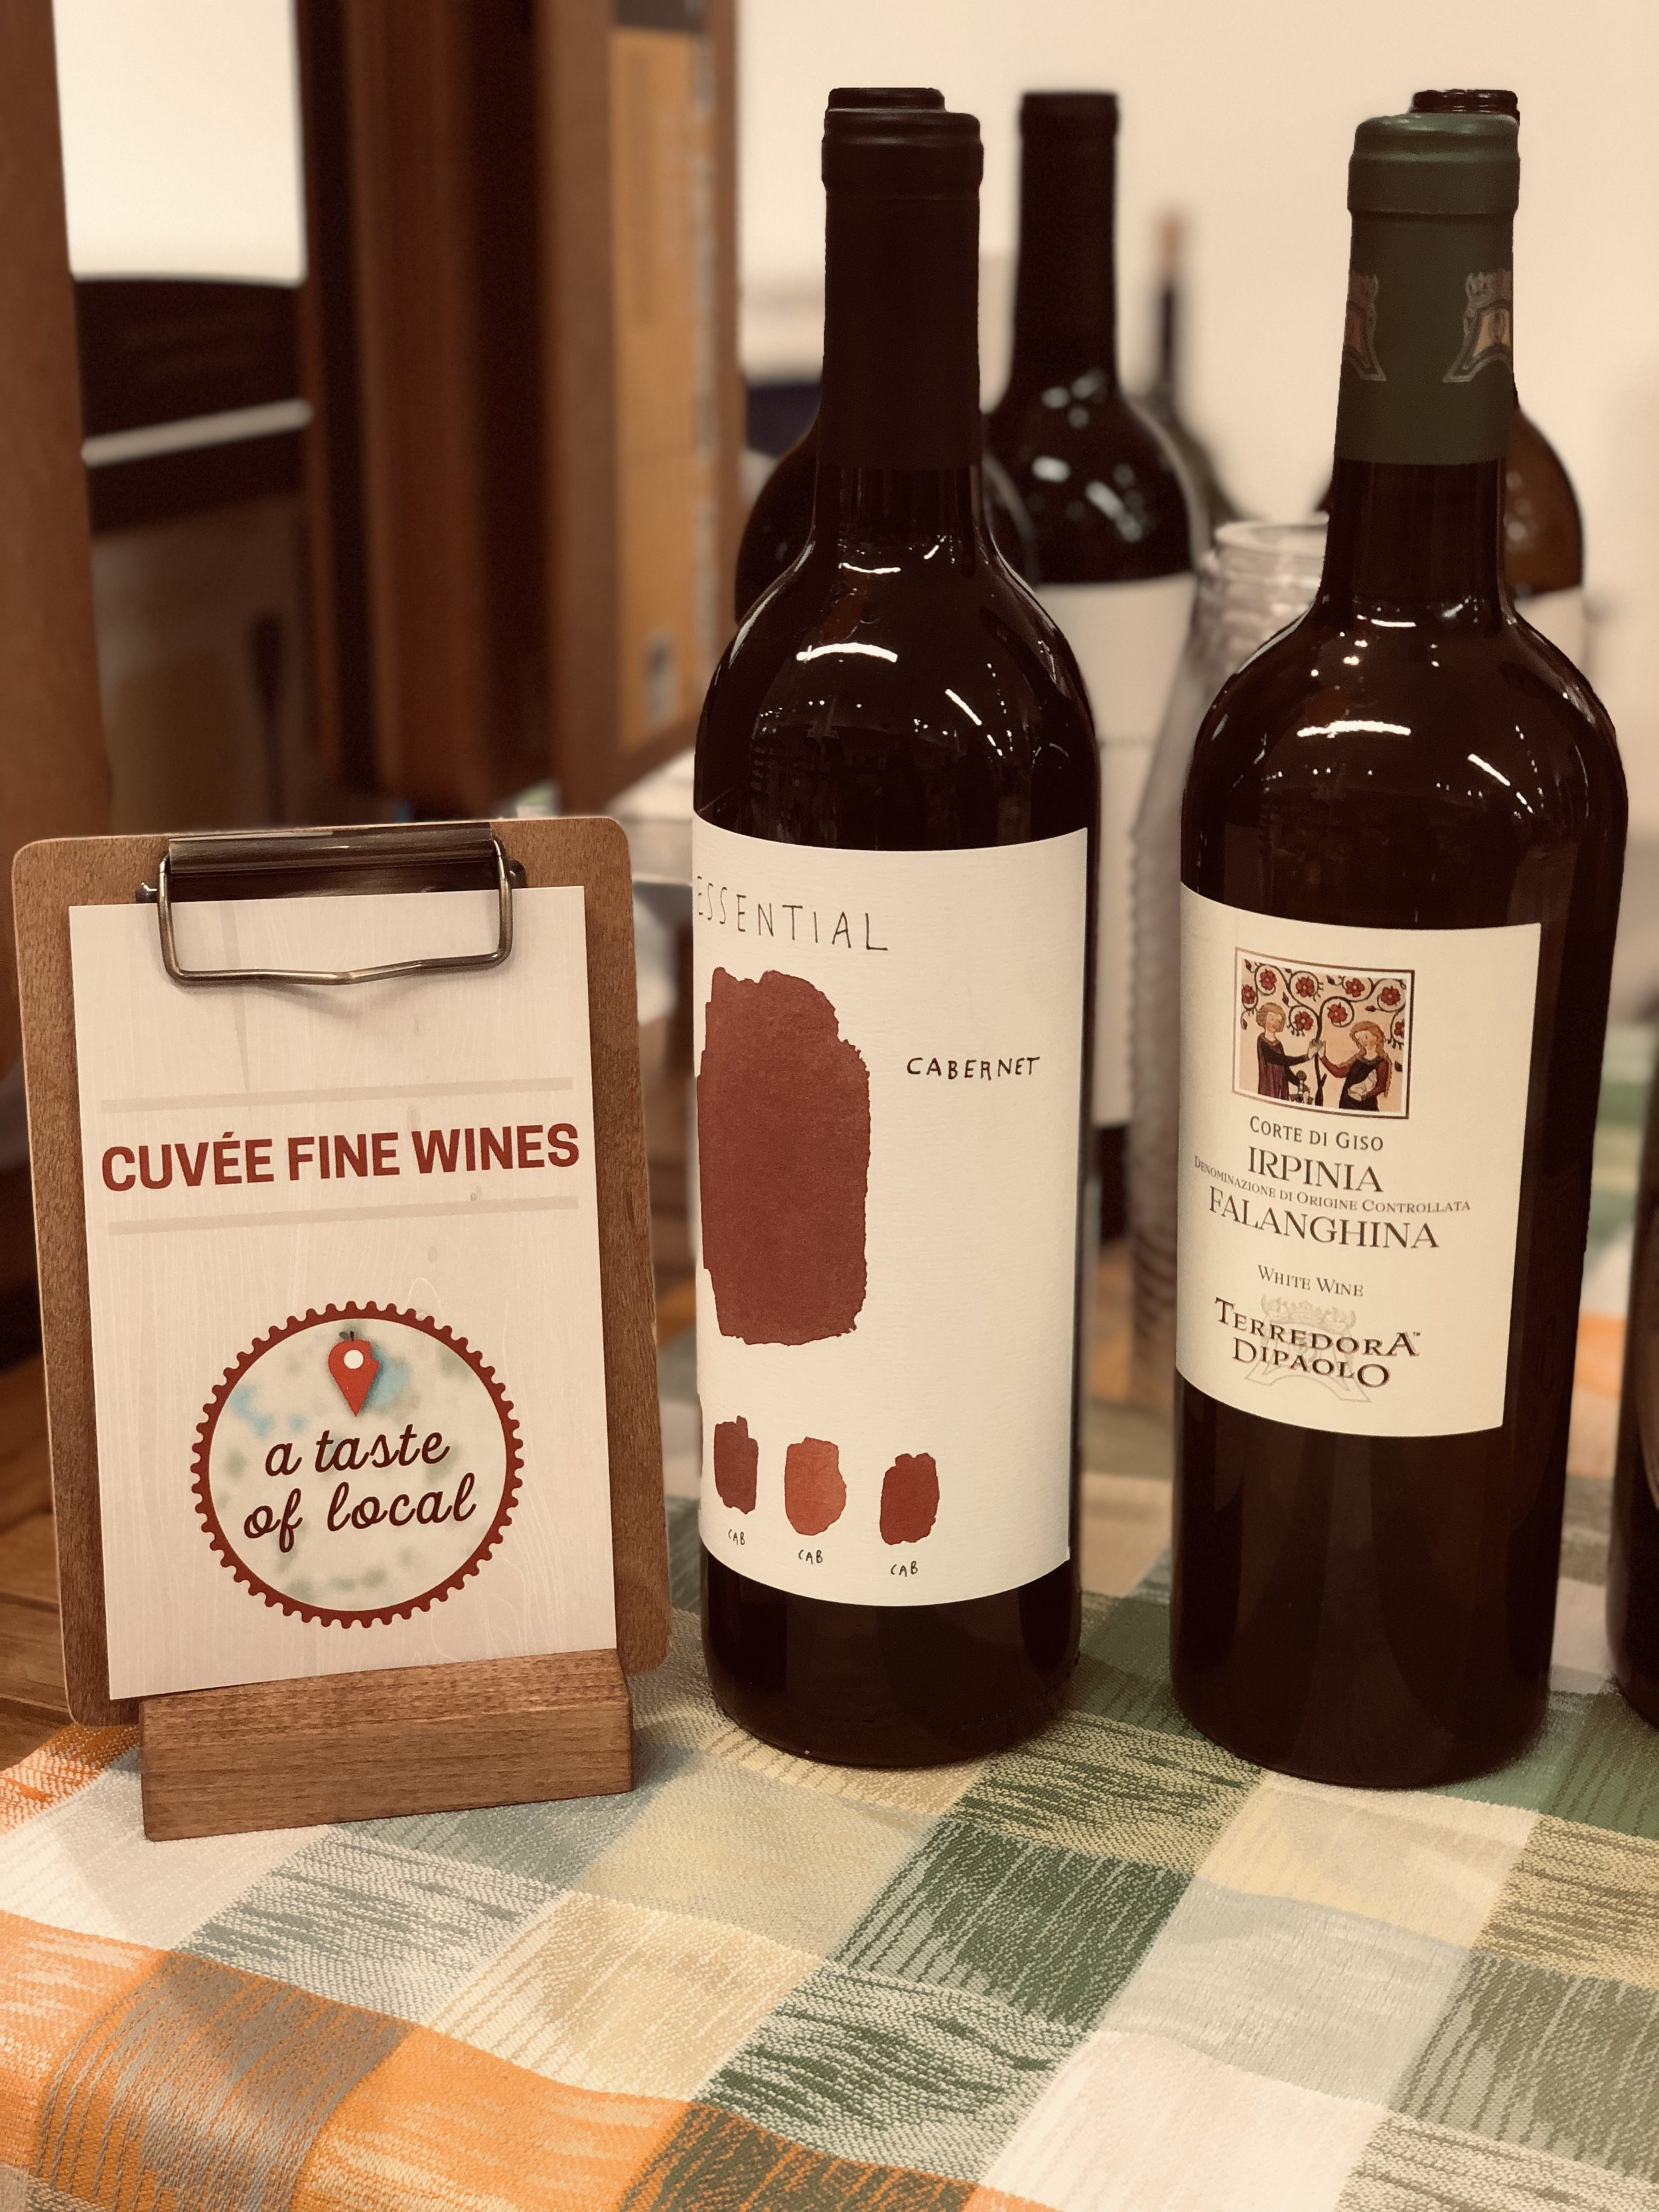 Cuvée Fine Wines